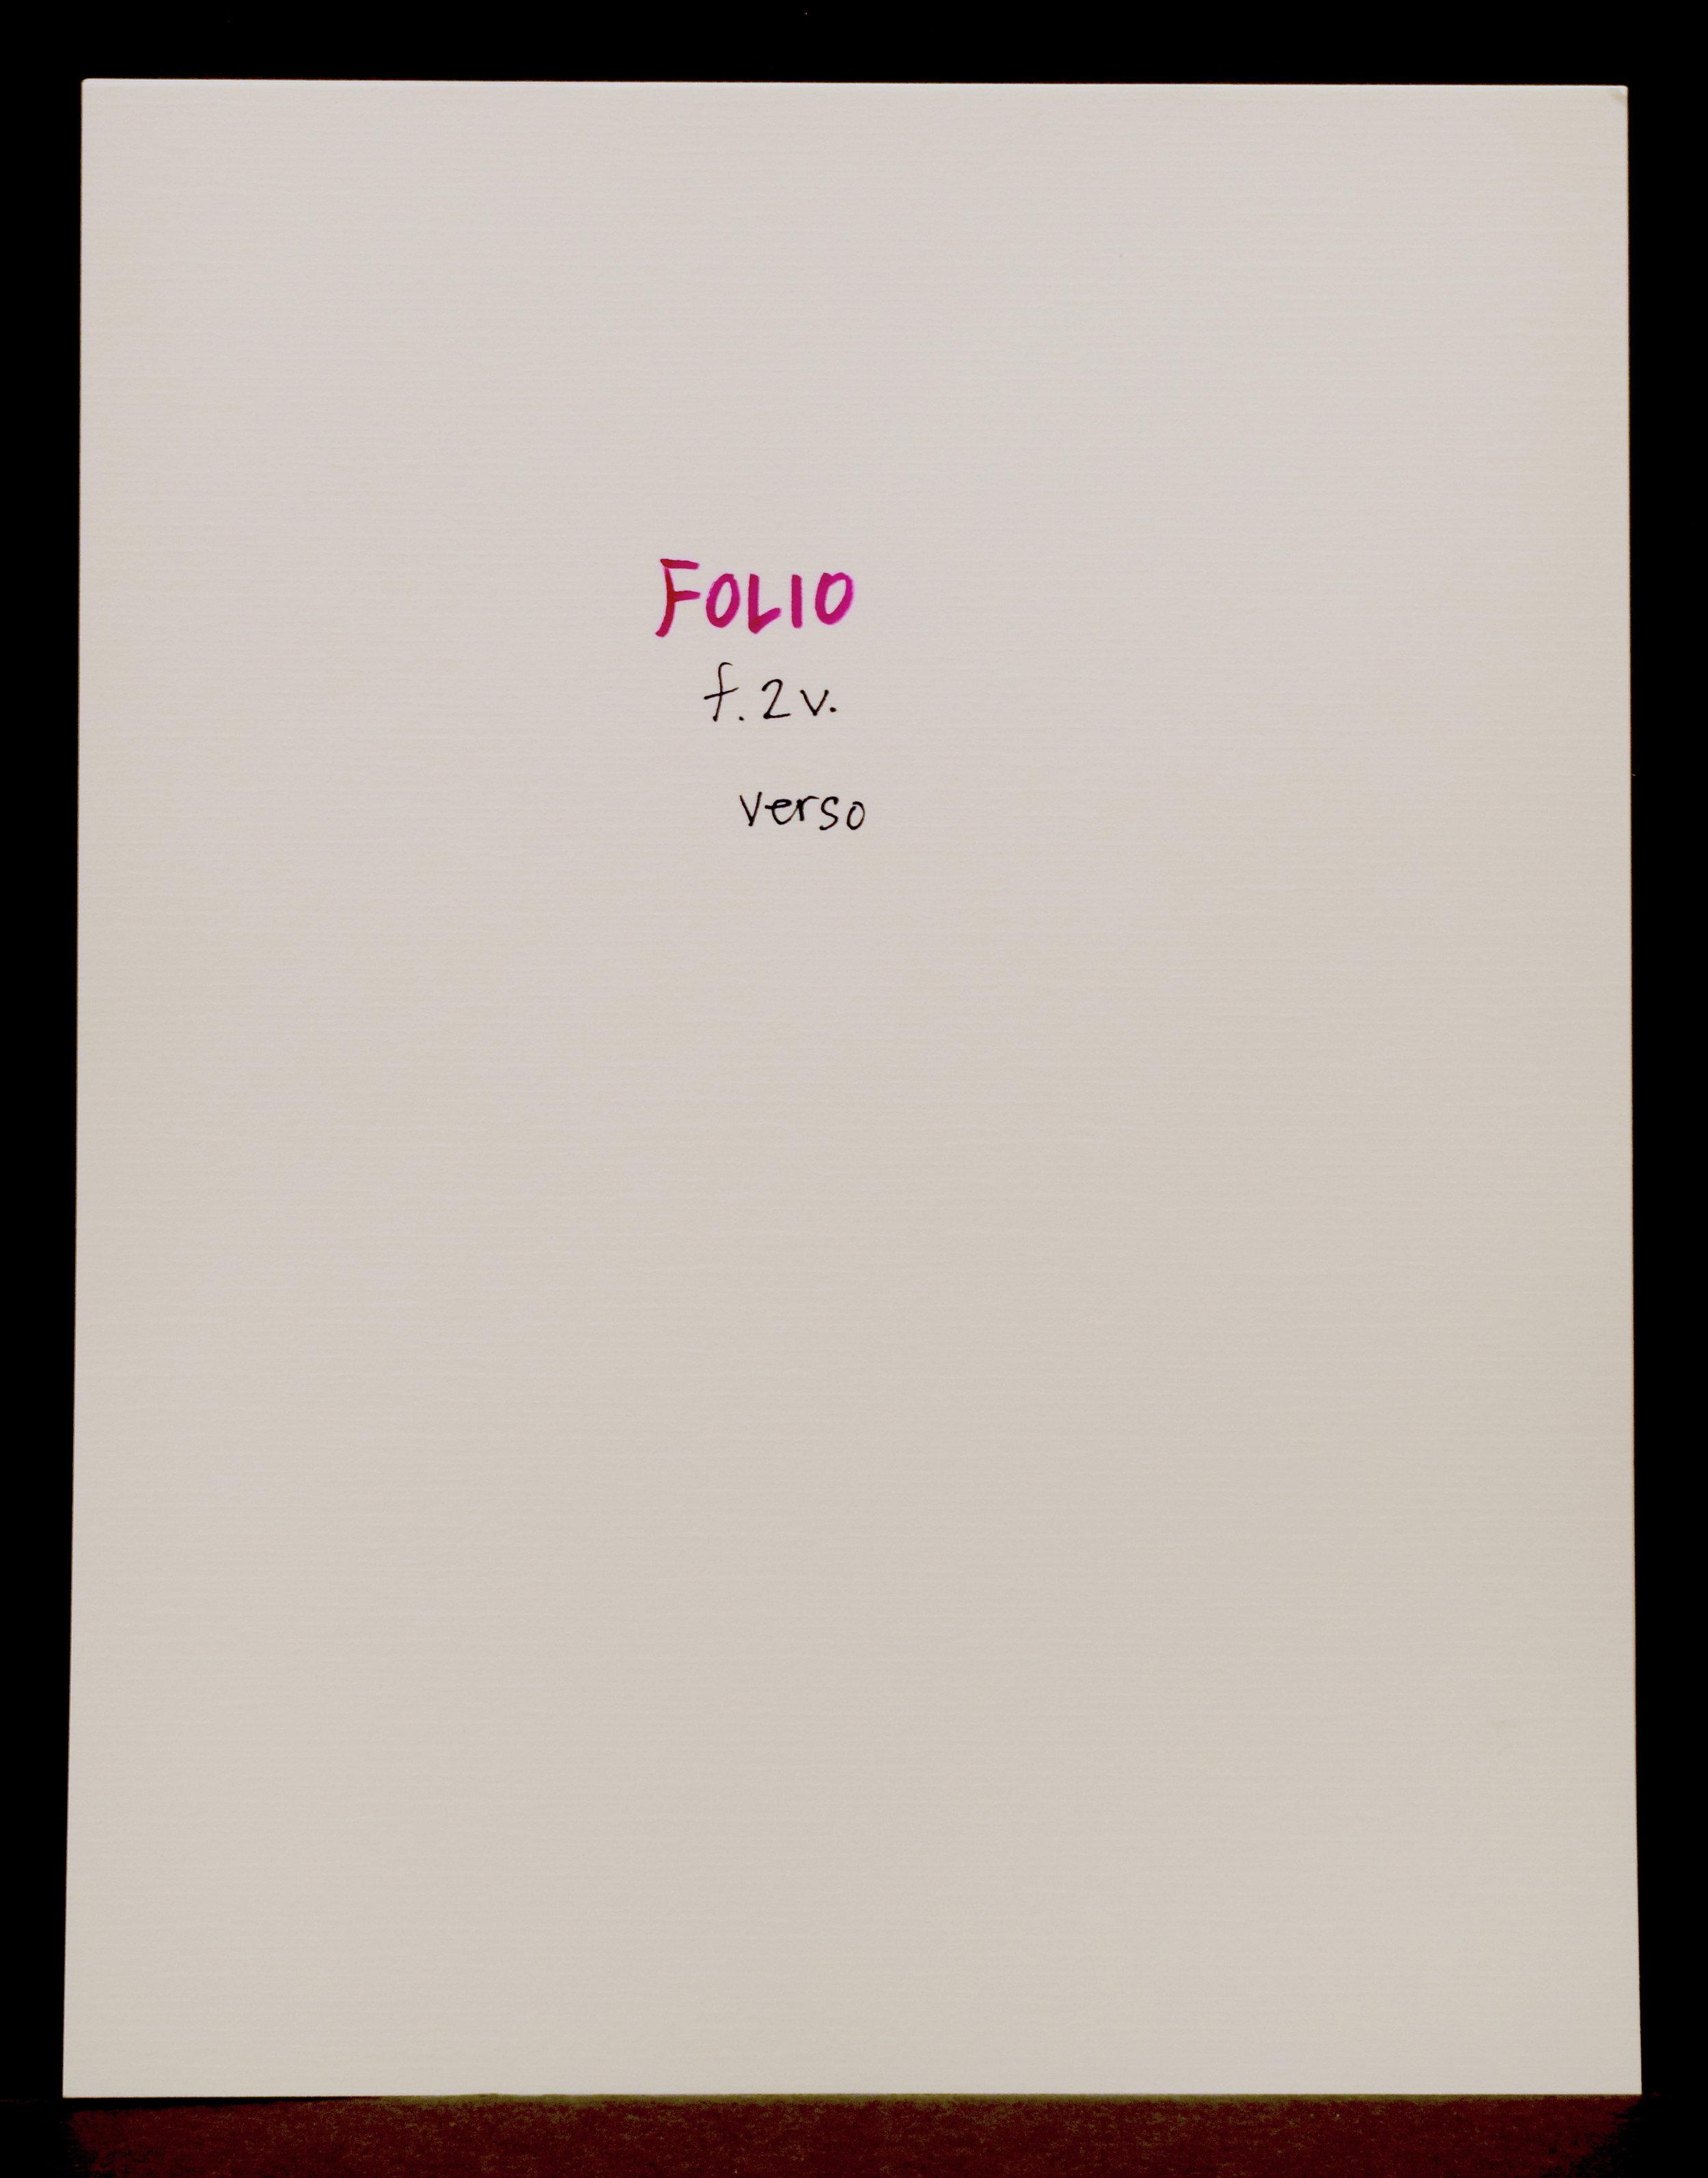 folio_verso_1_folium_DSC_0786.JPG